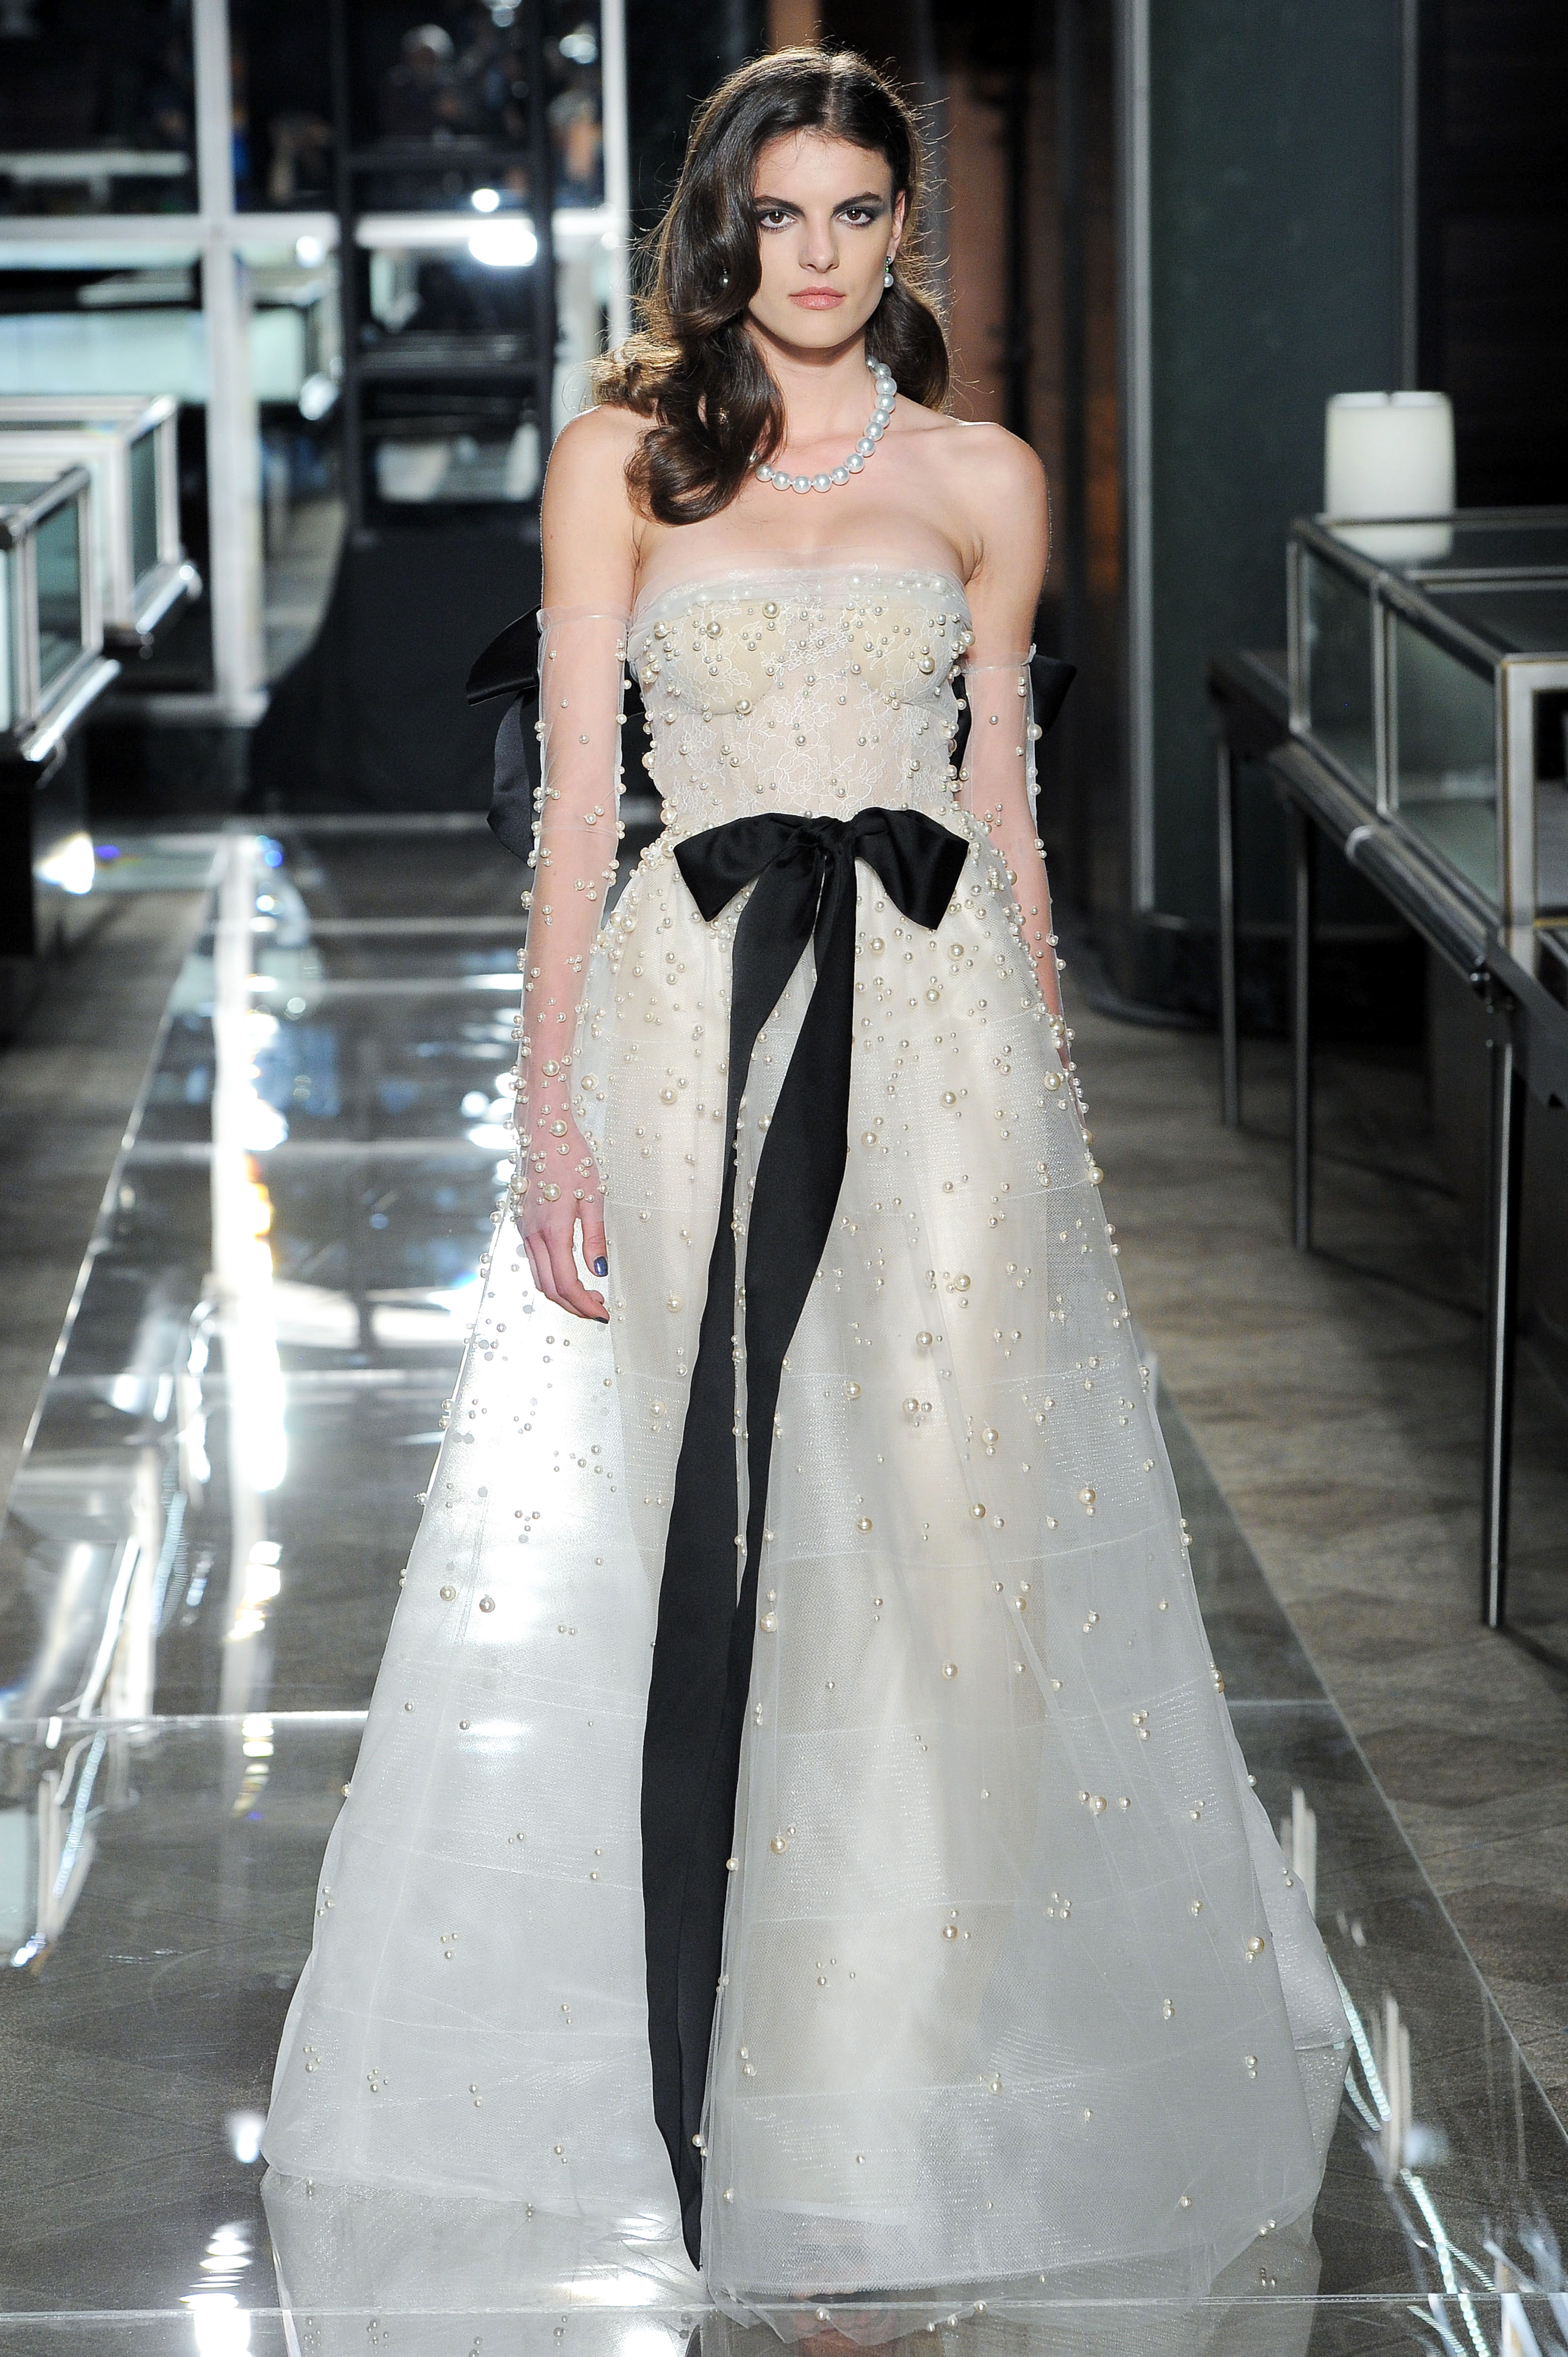 reem acra spring 2018 a-line wedding dress with black bow